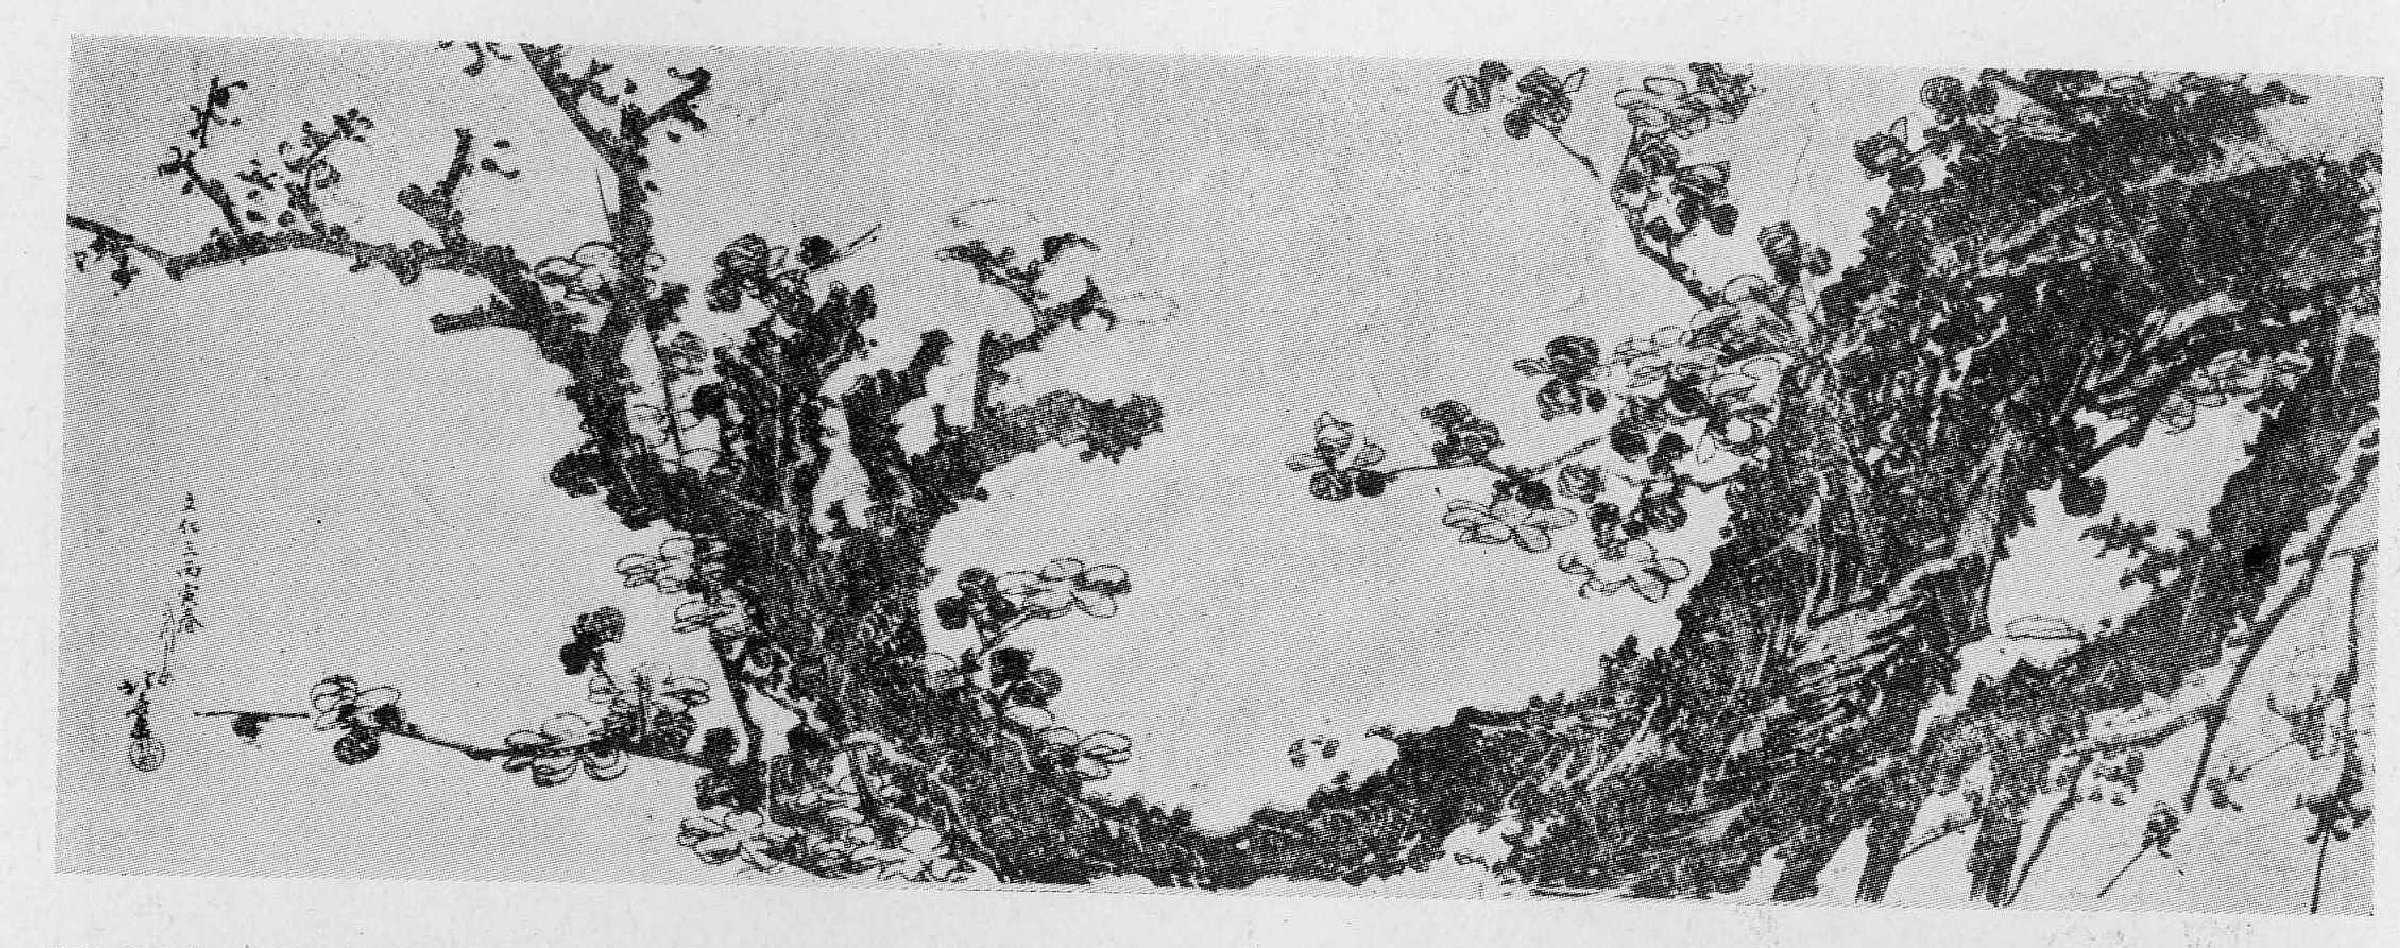 葛飾北斎の画像 p1_28